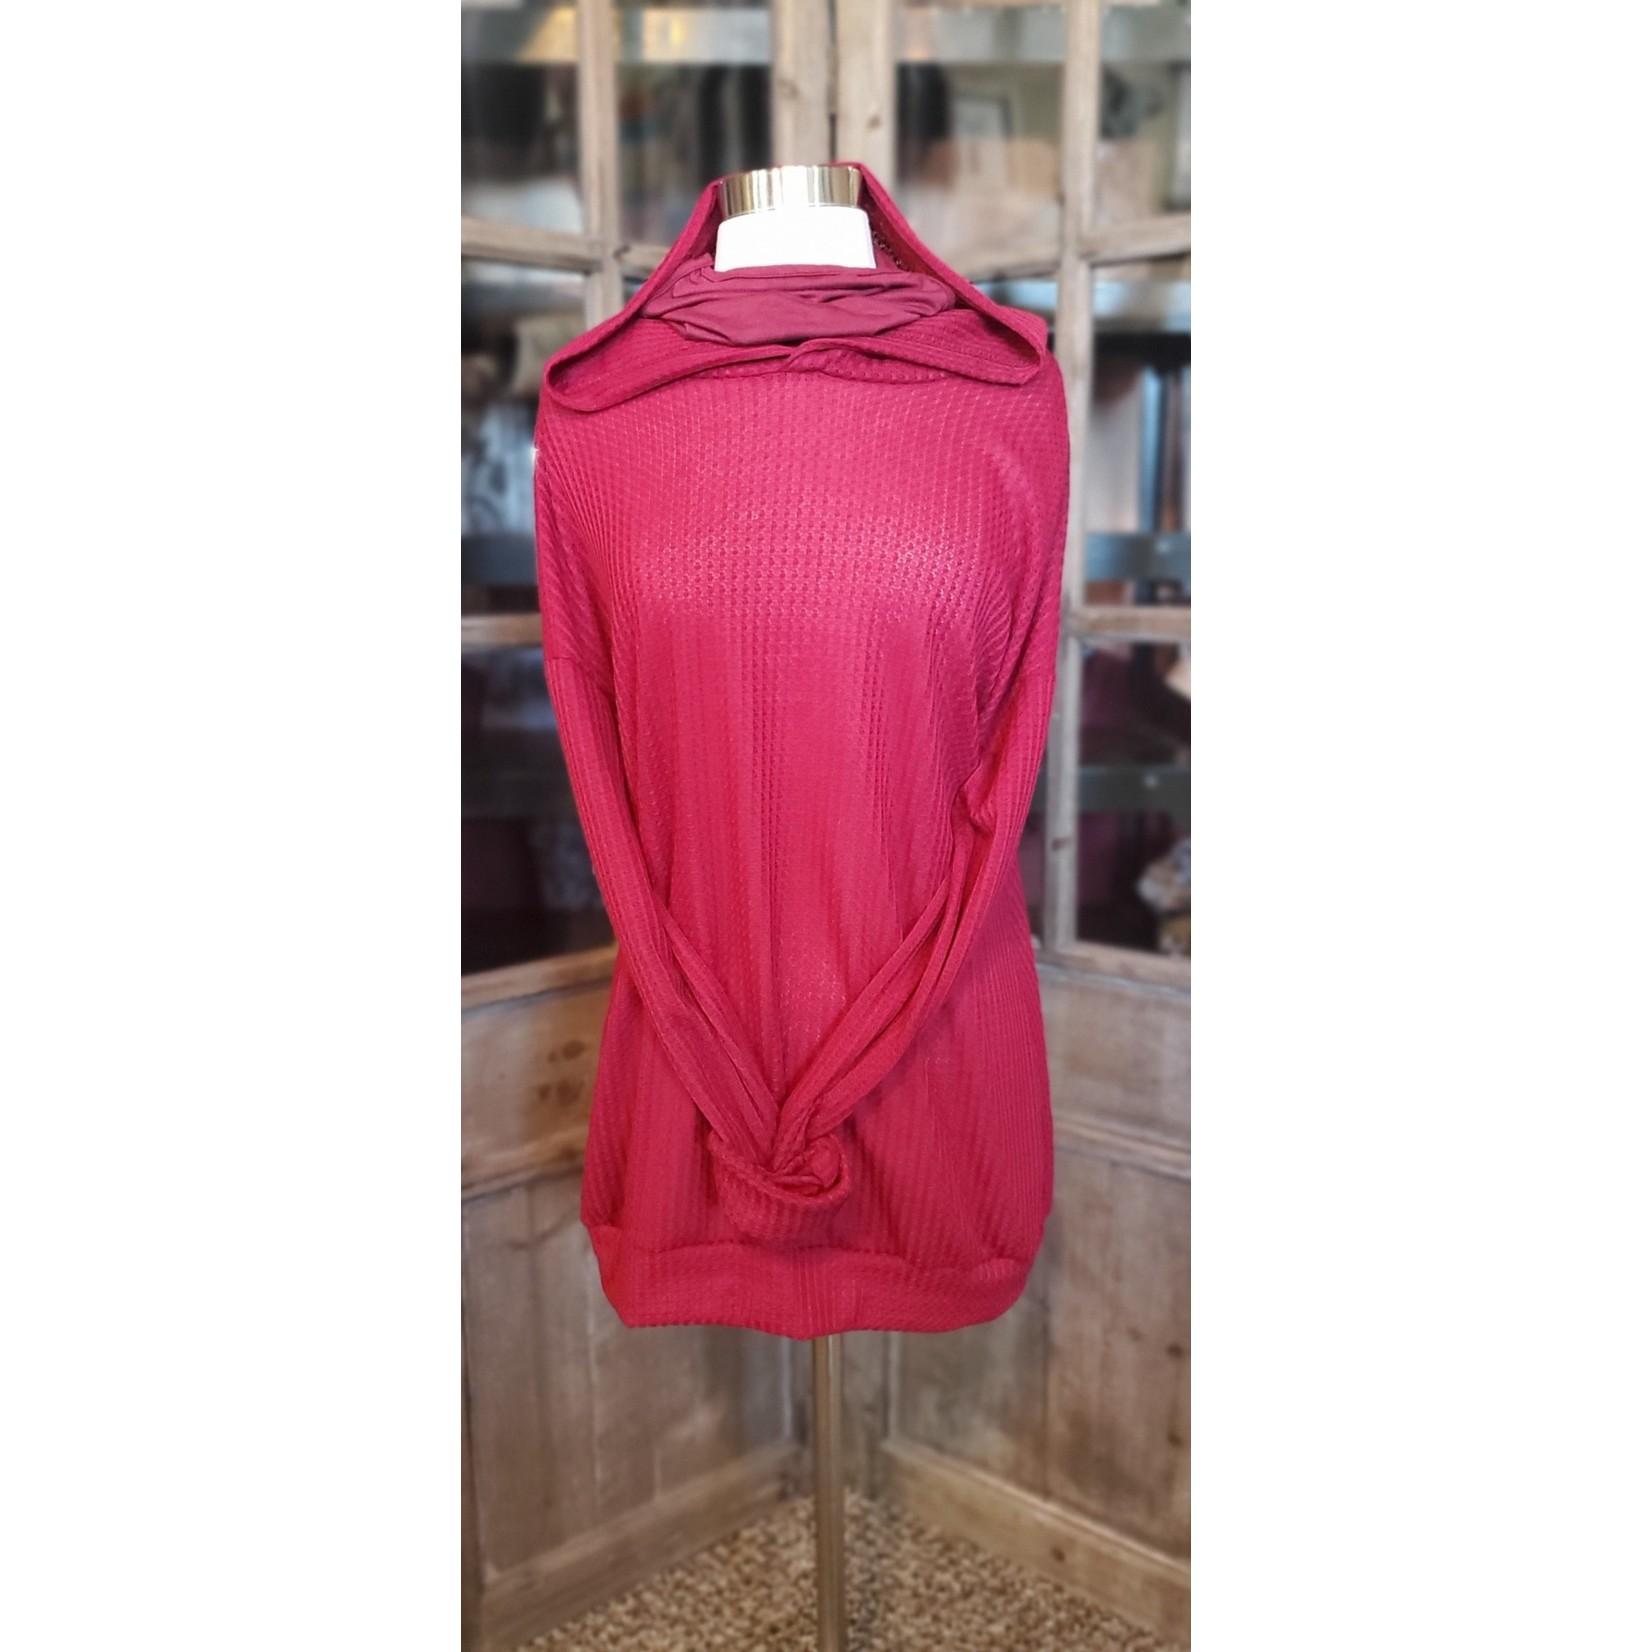 Blumin Apparel Knitwear: Burgandy Thermal Mask Hoodie